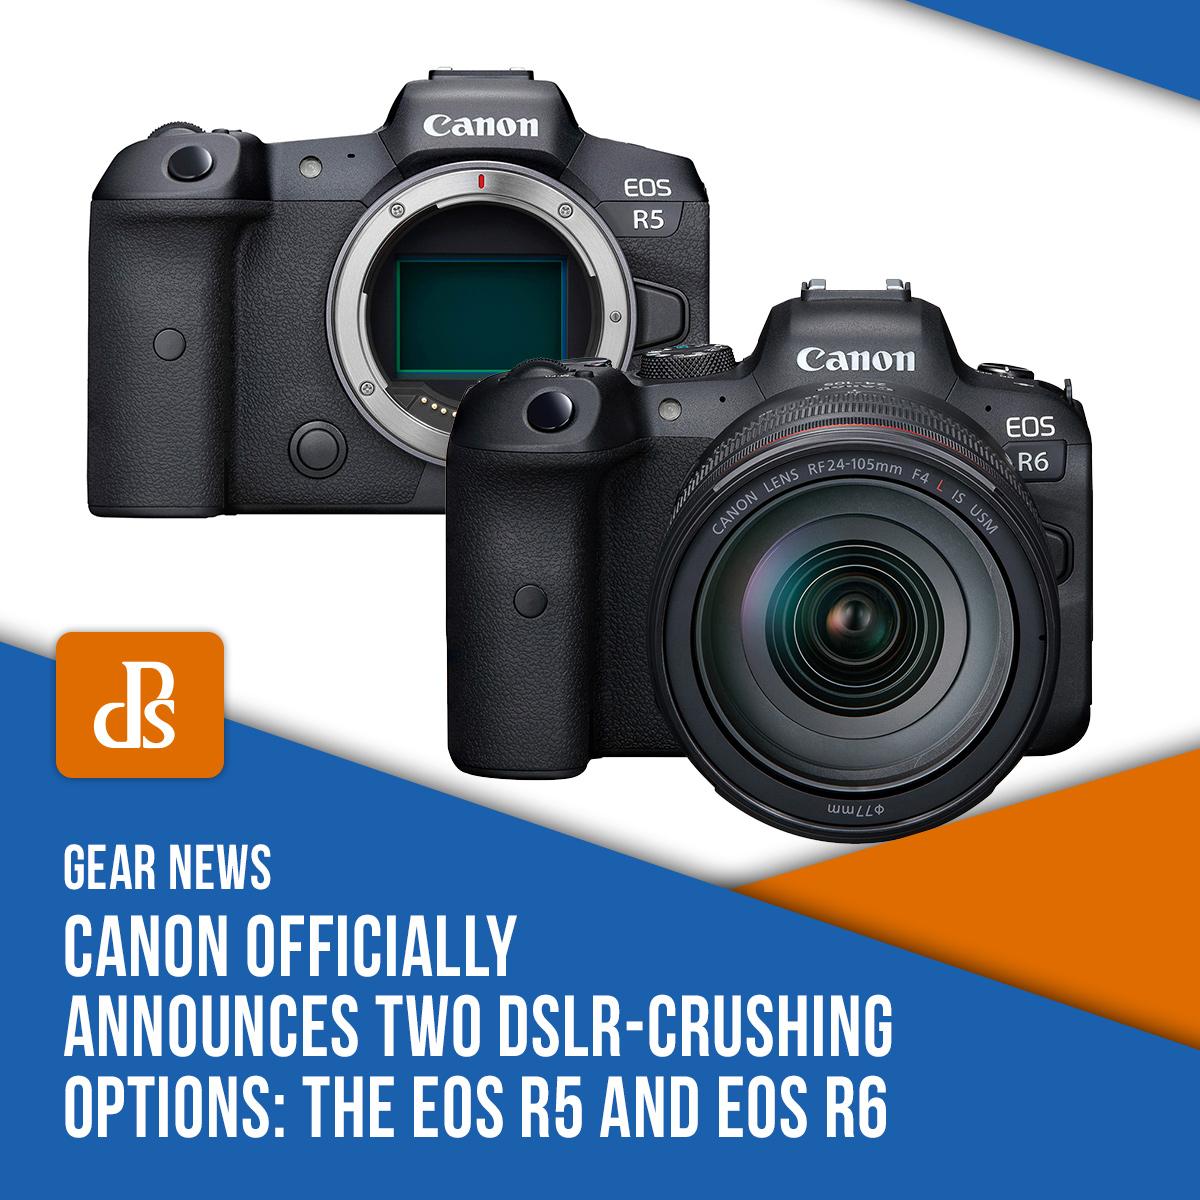 dps-news-canon-eos-r5-and-eos-r6